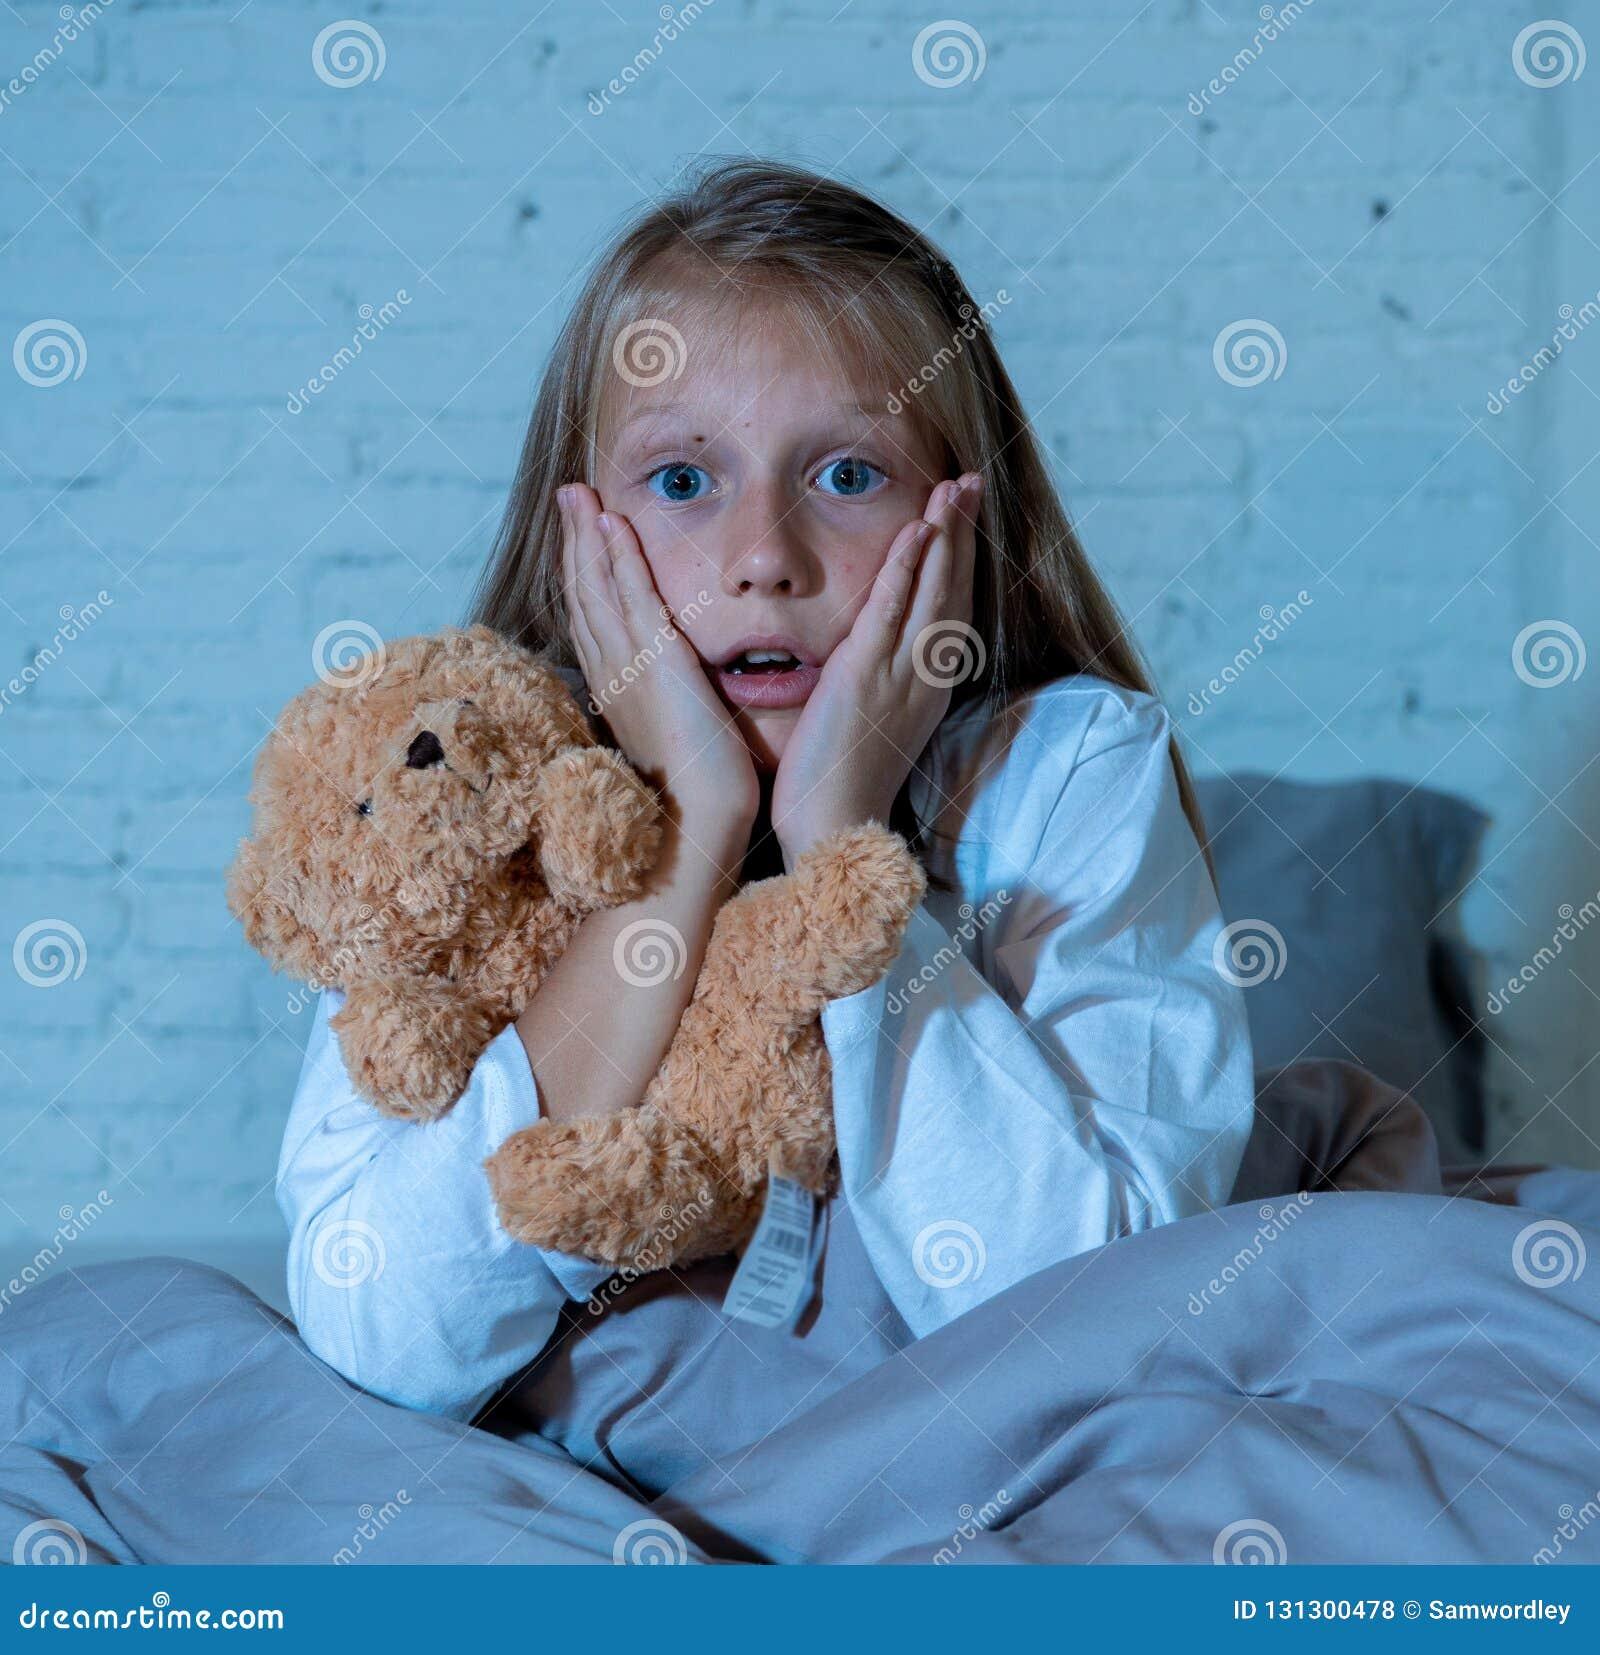 Little girls bedroom horror, women teens nud